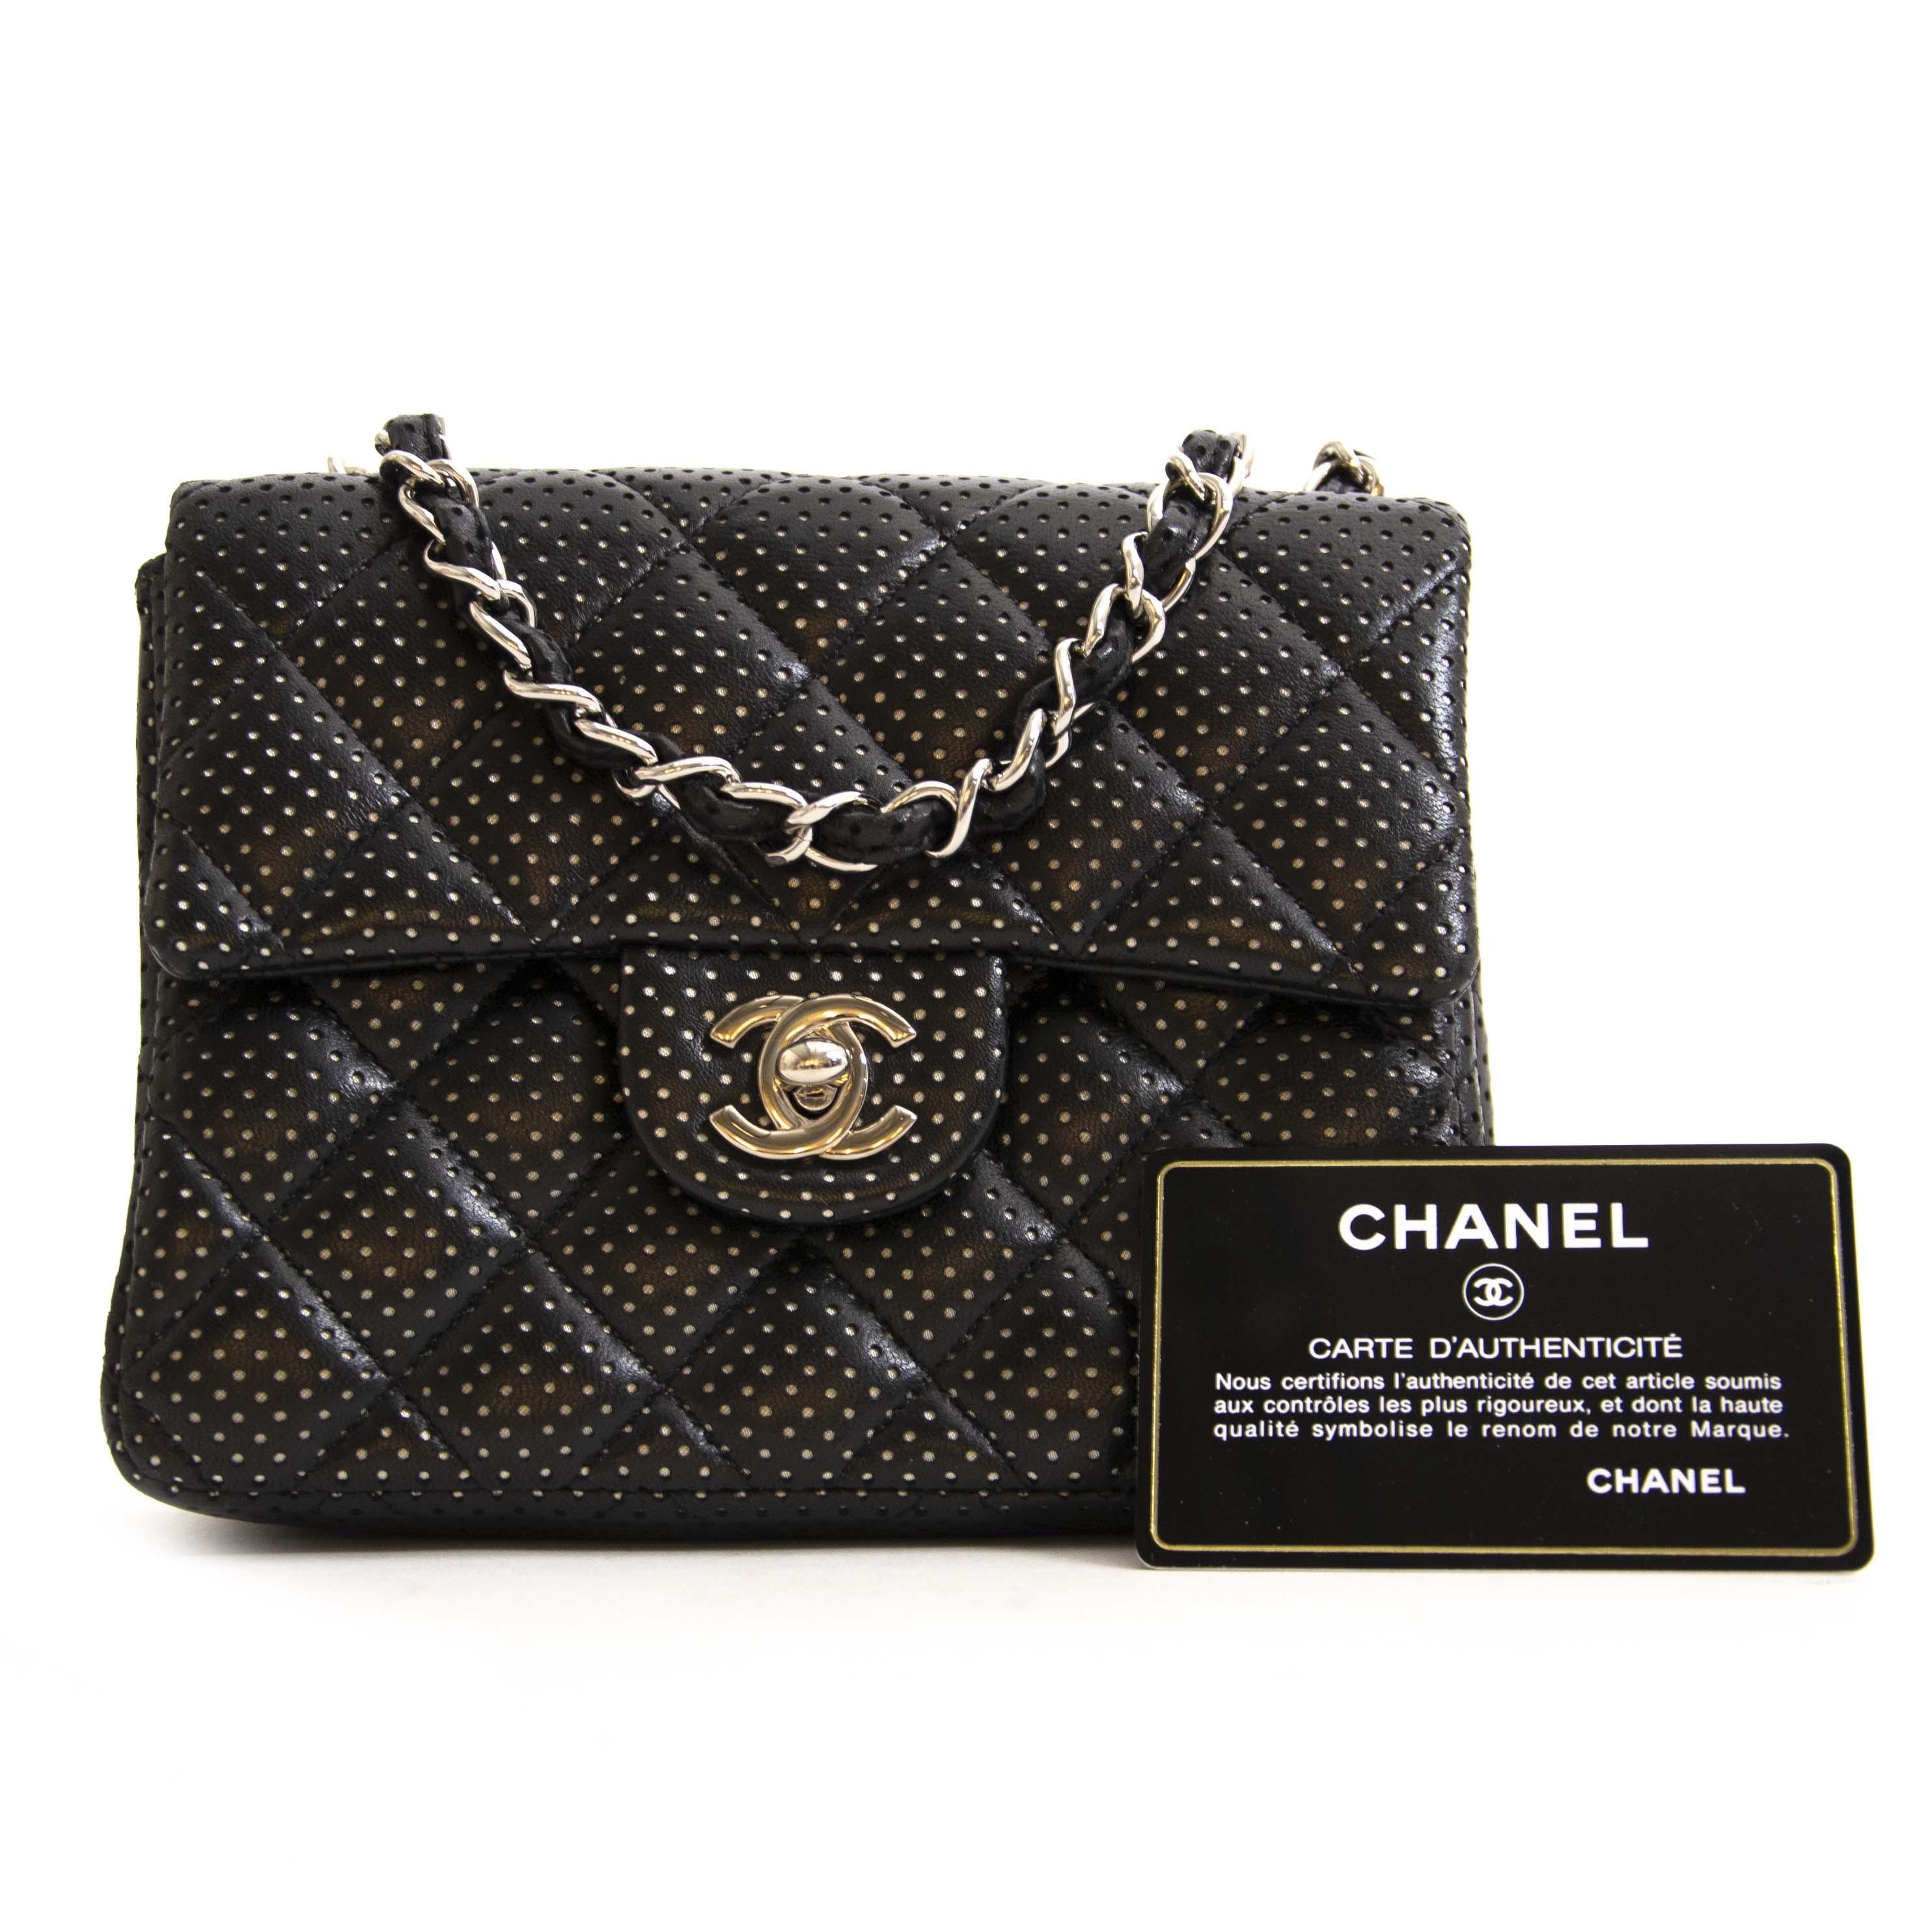 7ed4fdd3106ee5 ... Authentique seconde main Chanel Mini Square Perforated Quilted Bag  achète en ligne webshop LabelLOV